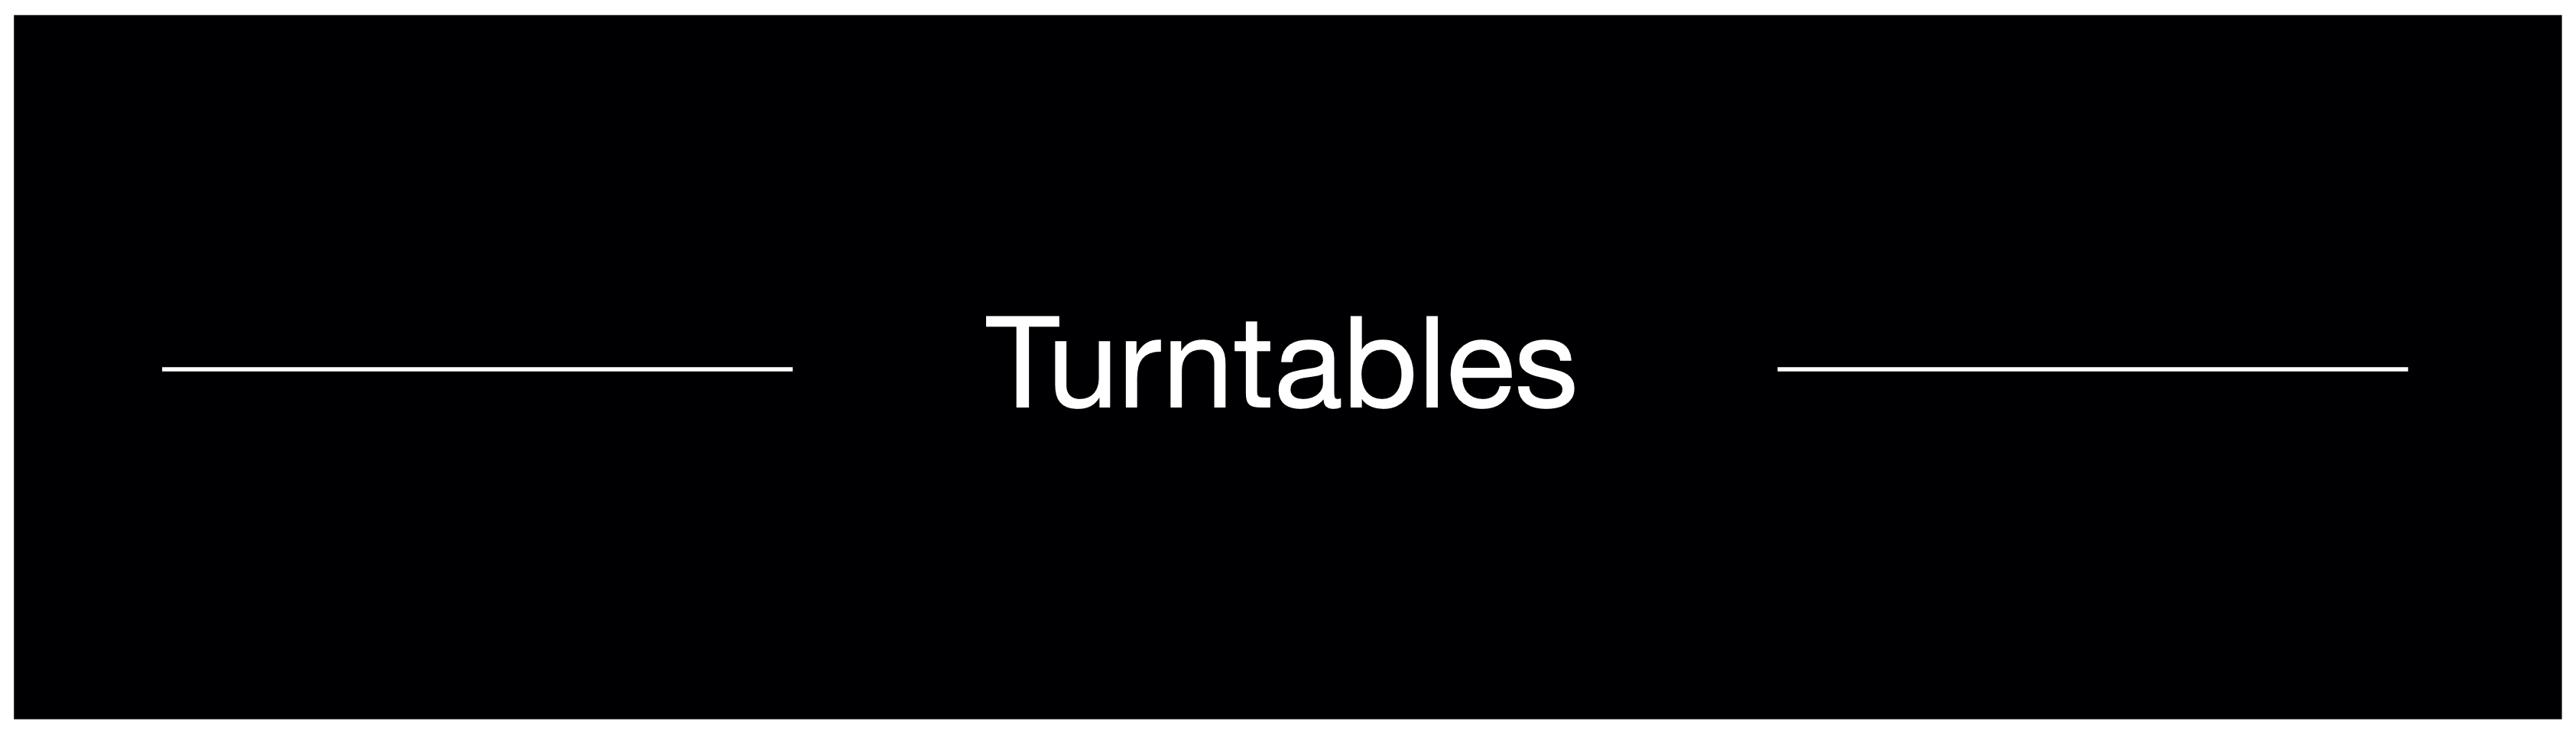 turntables-logo.jpg